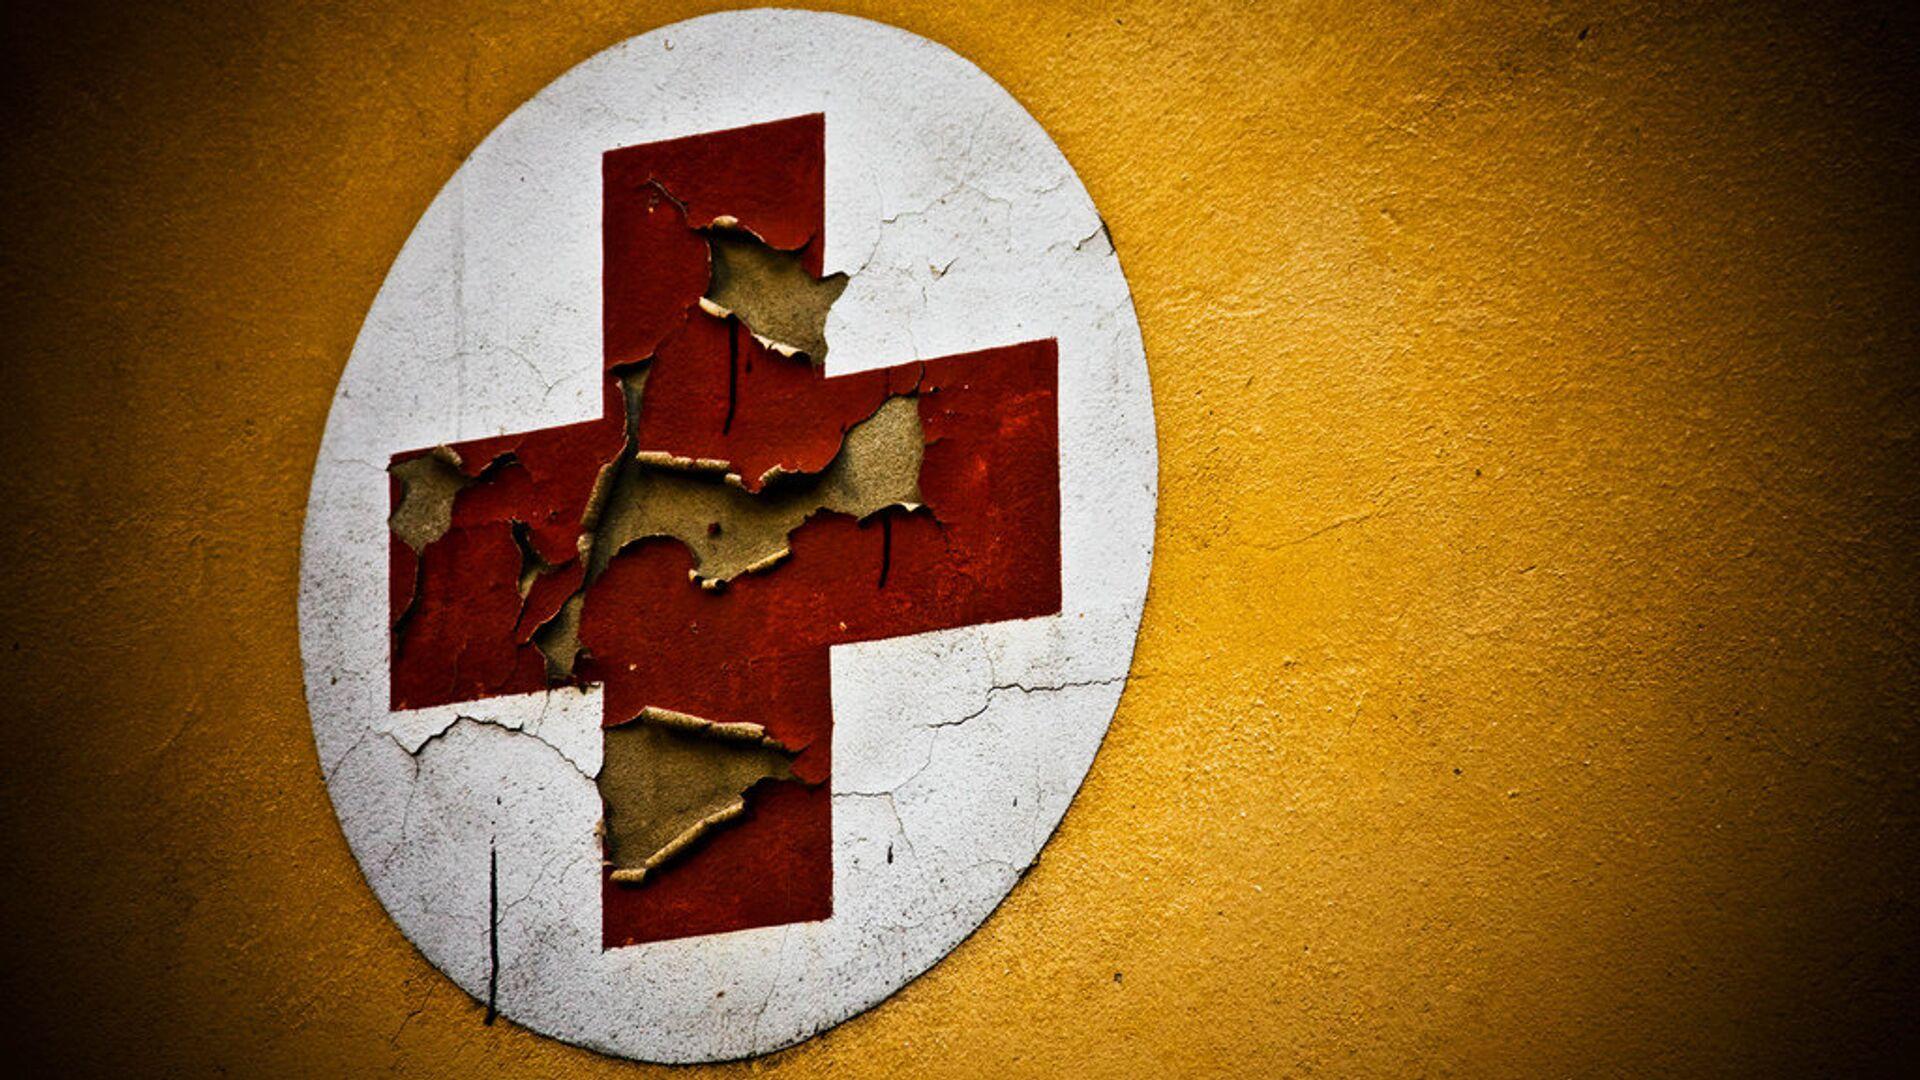 Cruz Roja - Sputnik Mundo, 1920, 24.03.2021